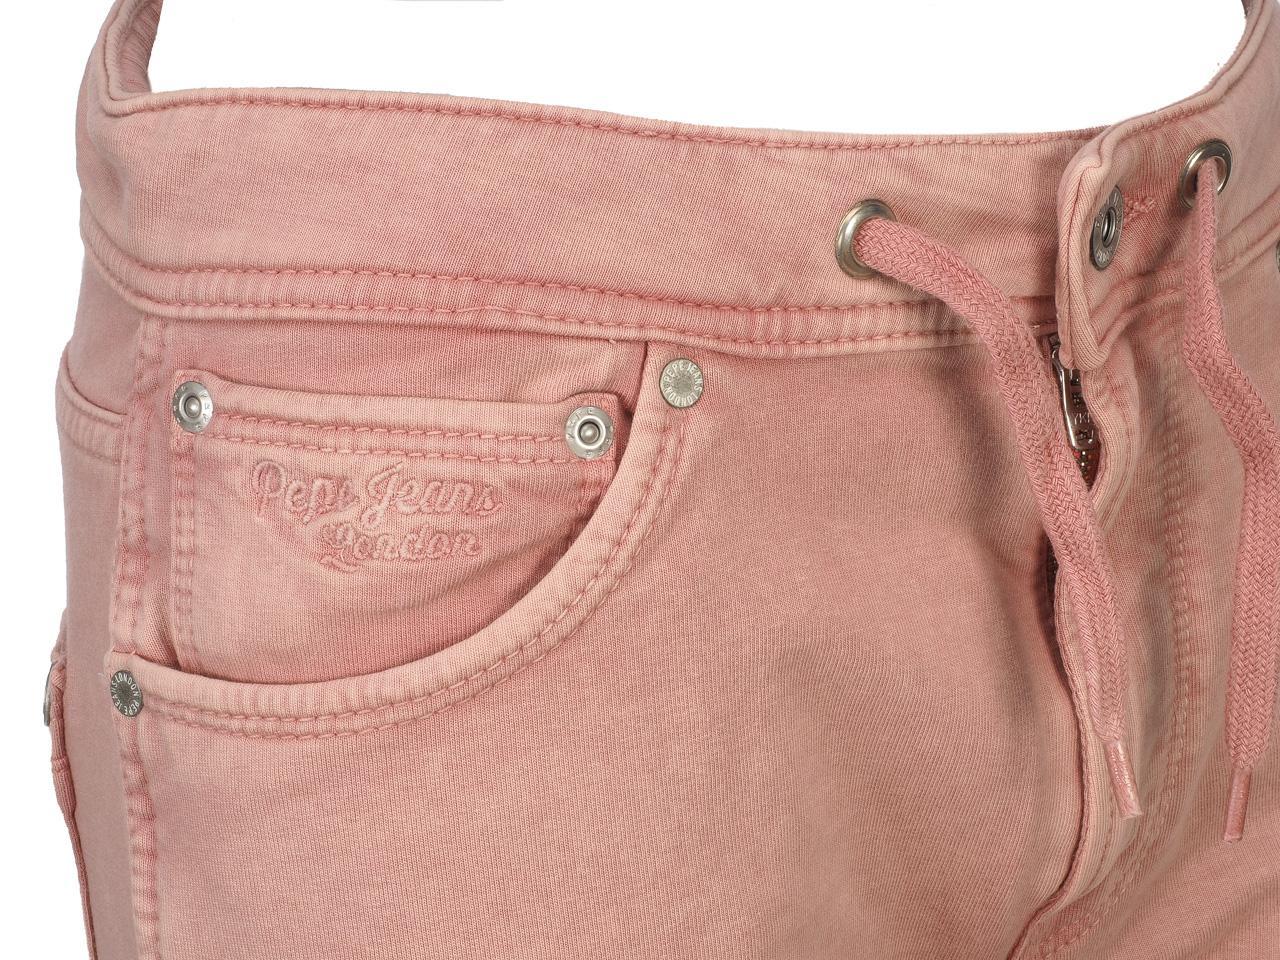 Bermuda-Shorts-Pepe-Jeans-Gene-Pink-Shorts-Jr-Pink-51544-New thumbnail 2